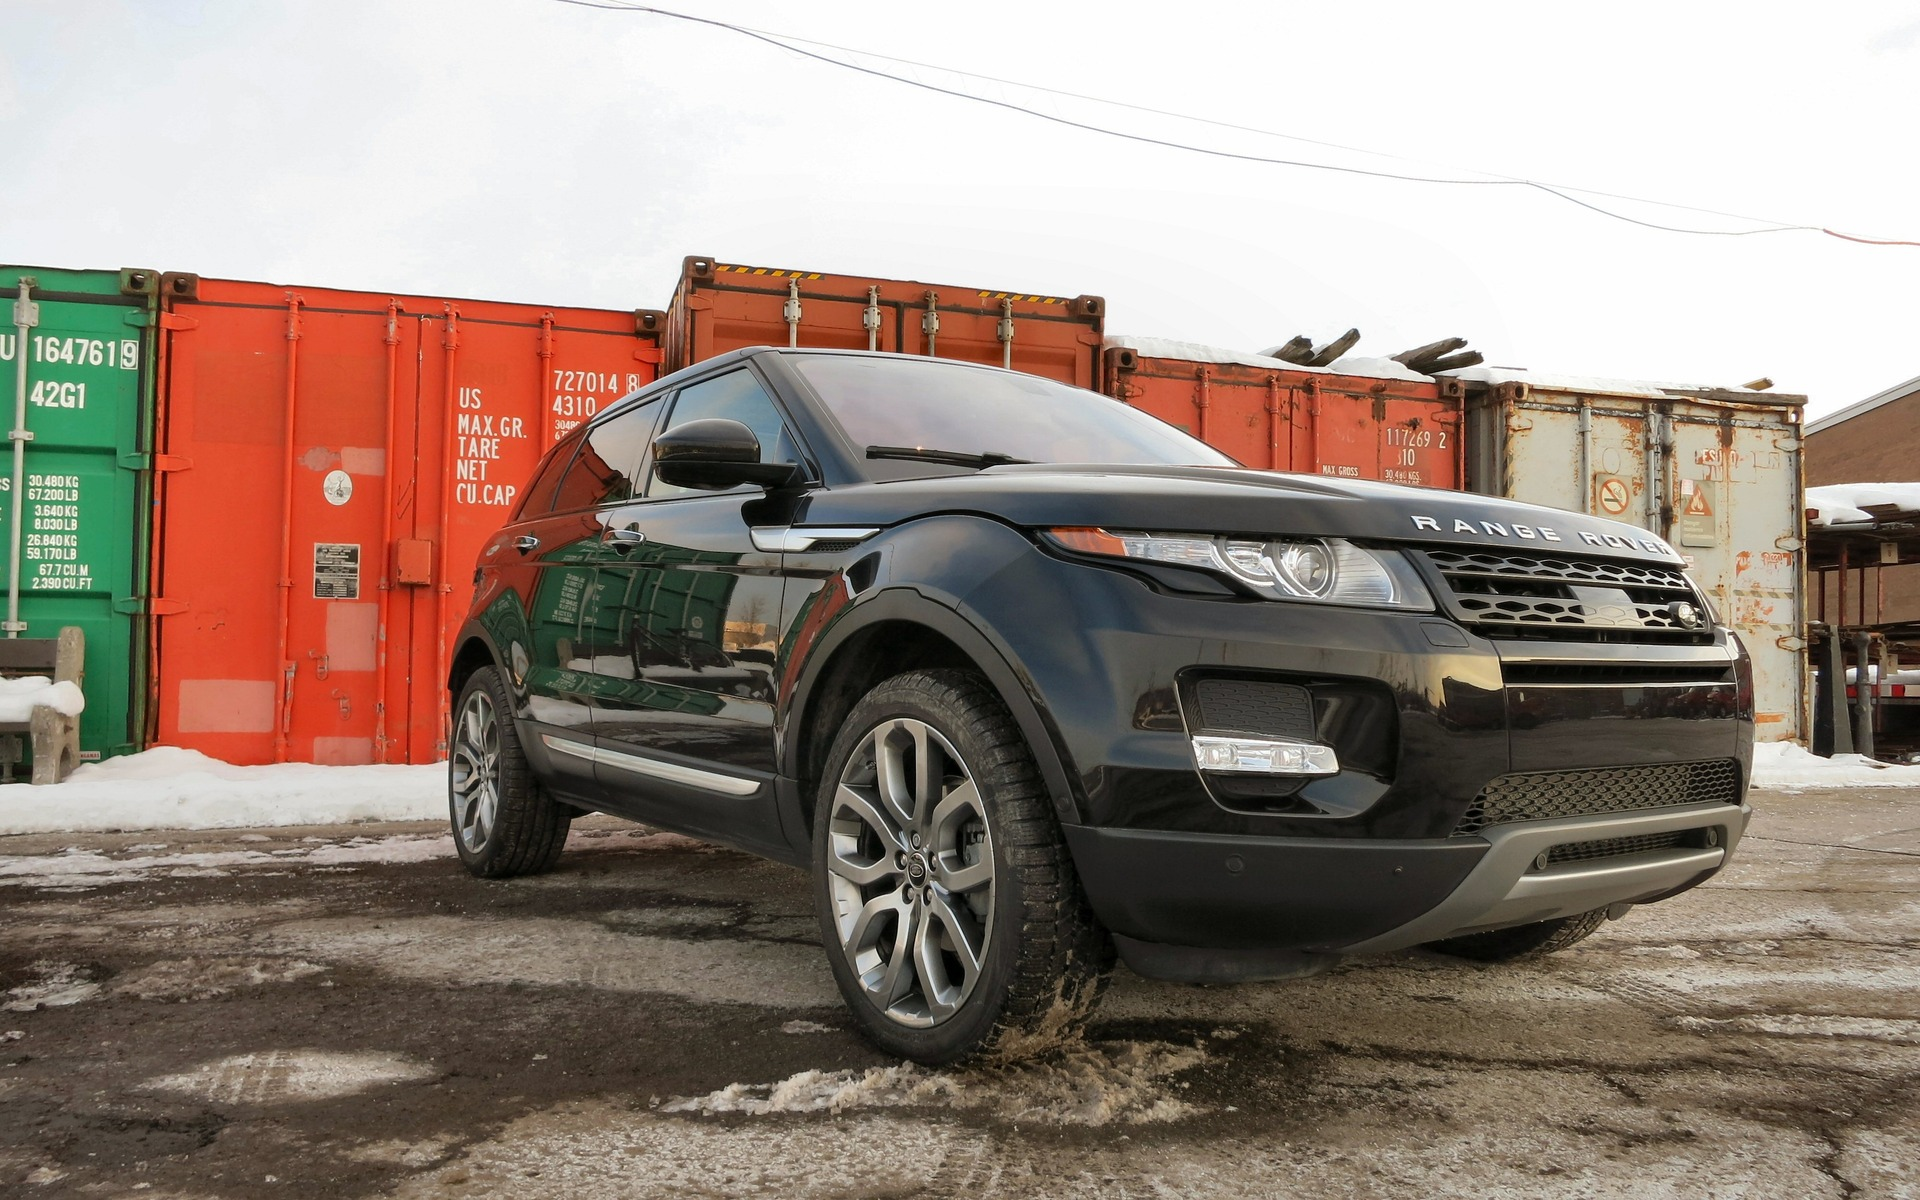 2015 Land Rover Range Rover Evoque Walk Your Own Path The Car Guide